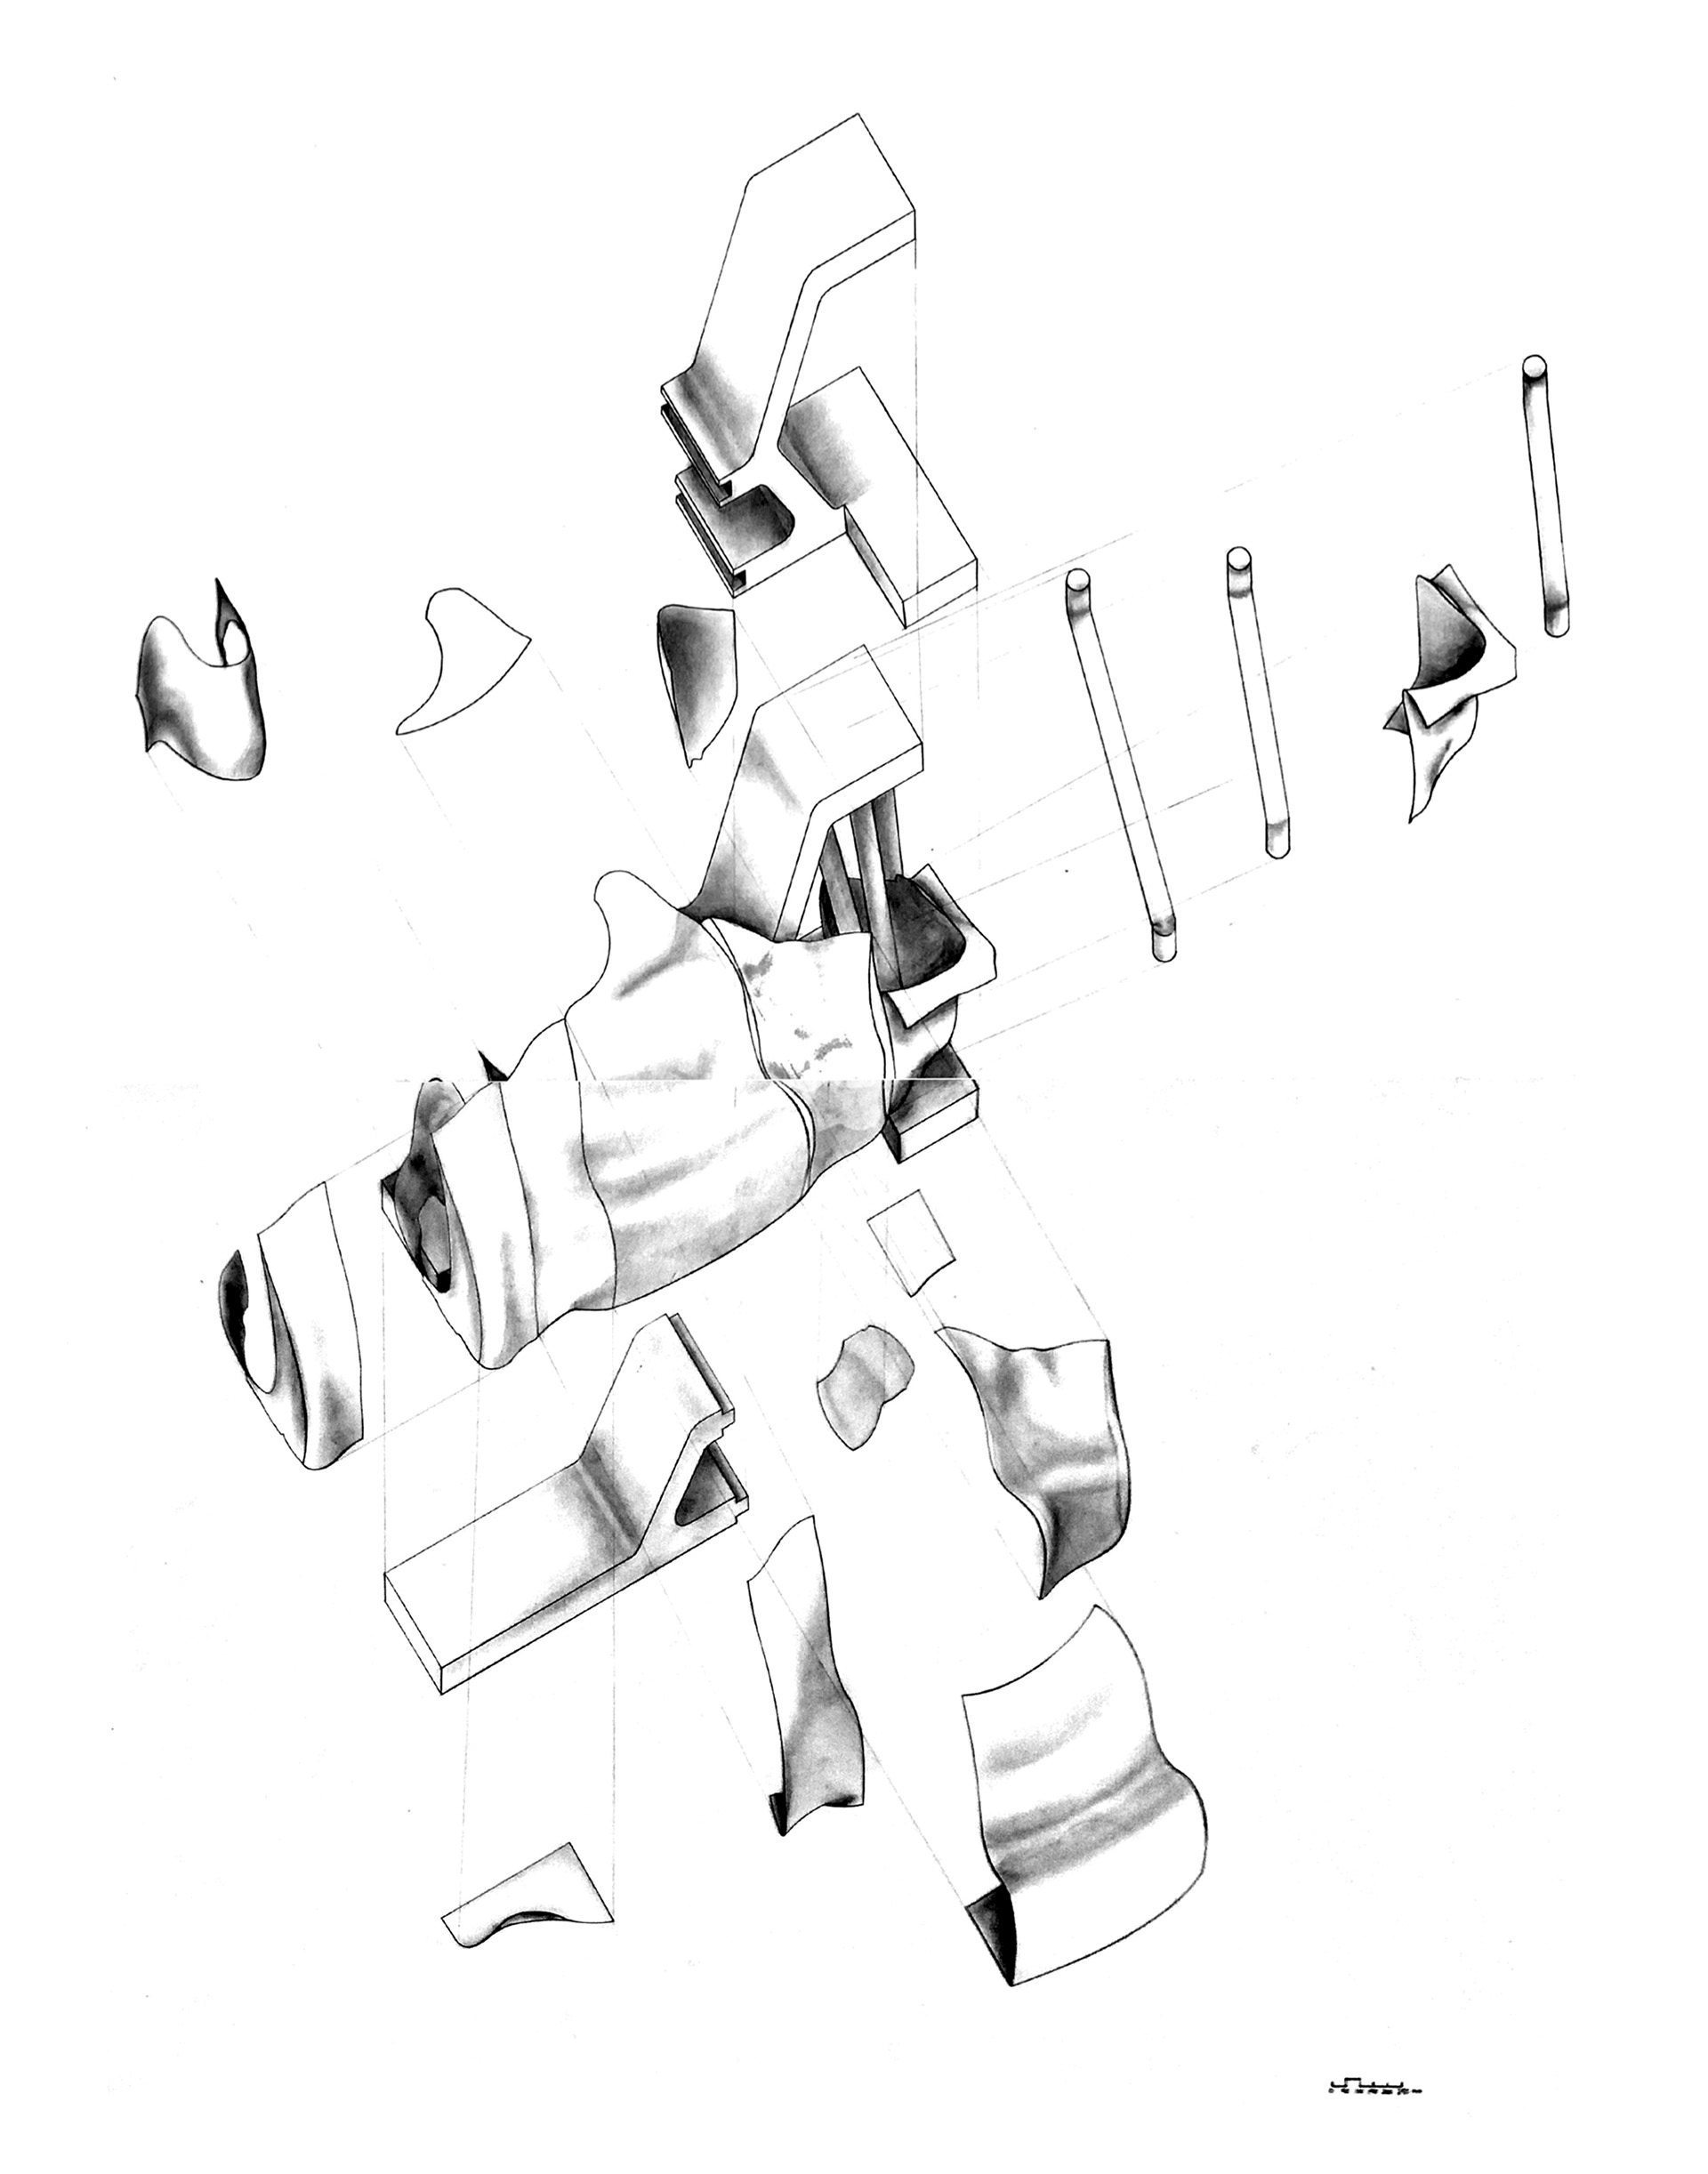 Enlarge Photo: Exploded axonometric view of sitting object. By WONG Hon Ting, ZHAO Ruoning, CHENG Tsz Kwok.